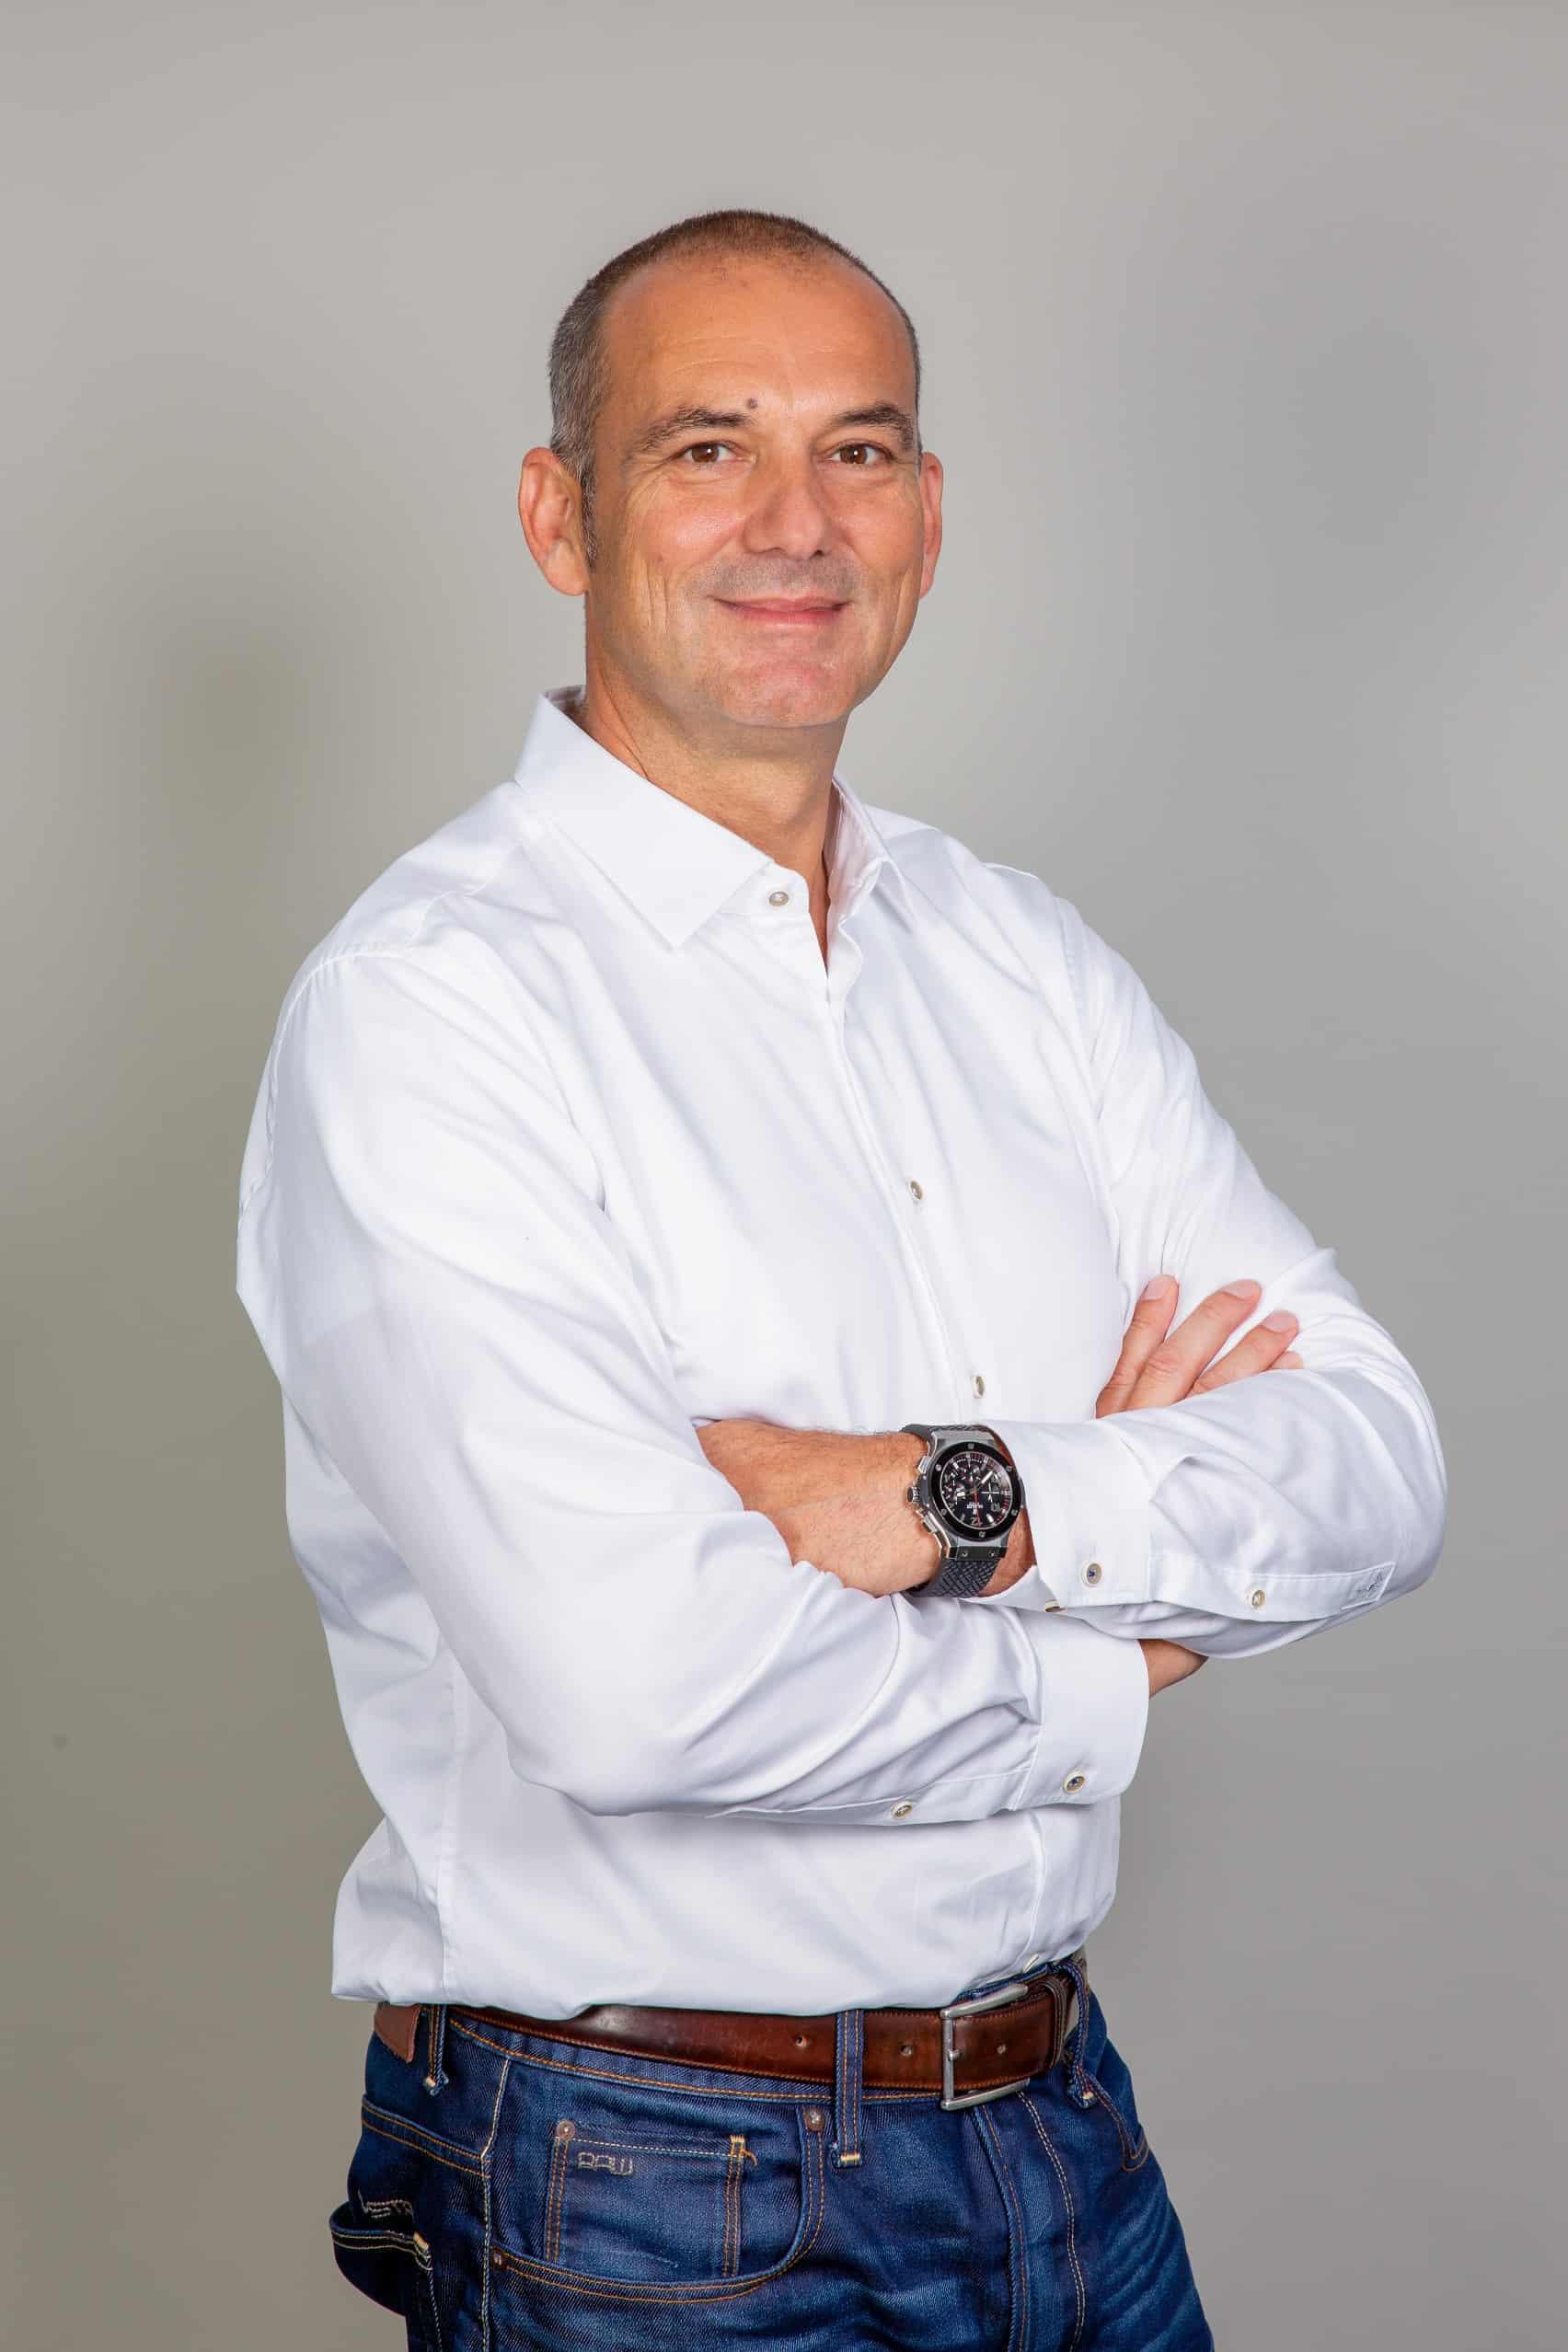 Wolfgang Bonatz, CEO, ACCRETECH Europe GmbH